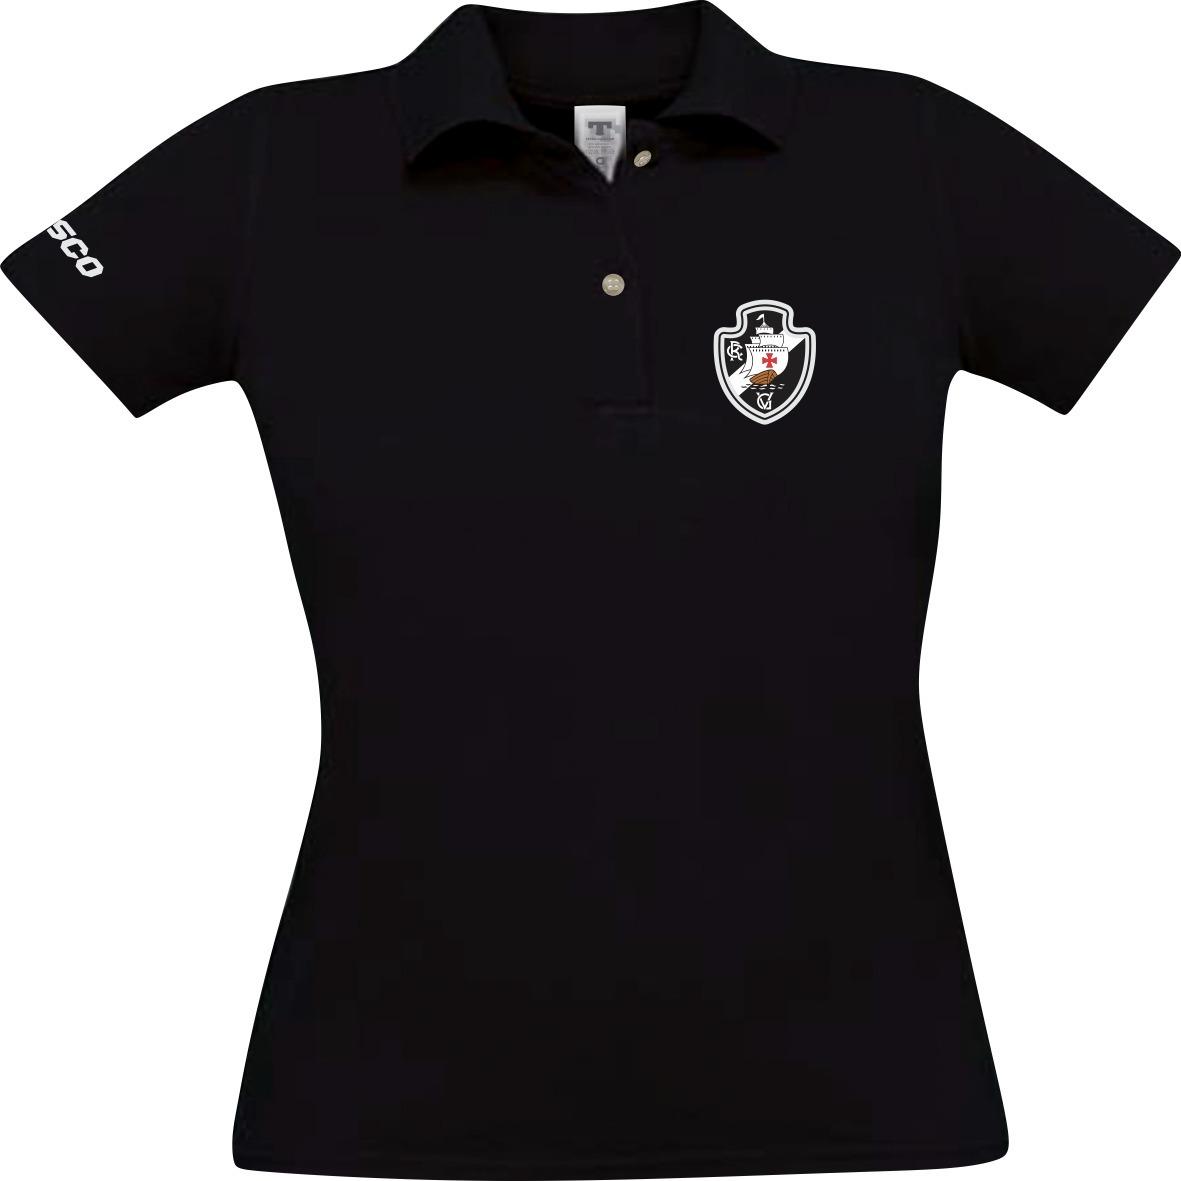 01044d62f1fc5 Camisa Camiseta Polo Feminina Do Vasco Blusa Vasco Da Gama - R  55 ...